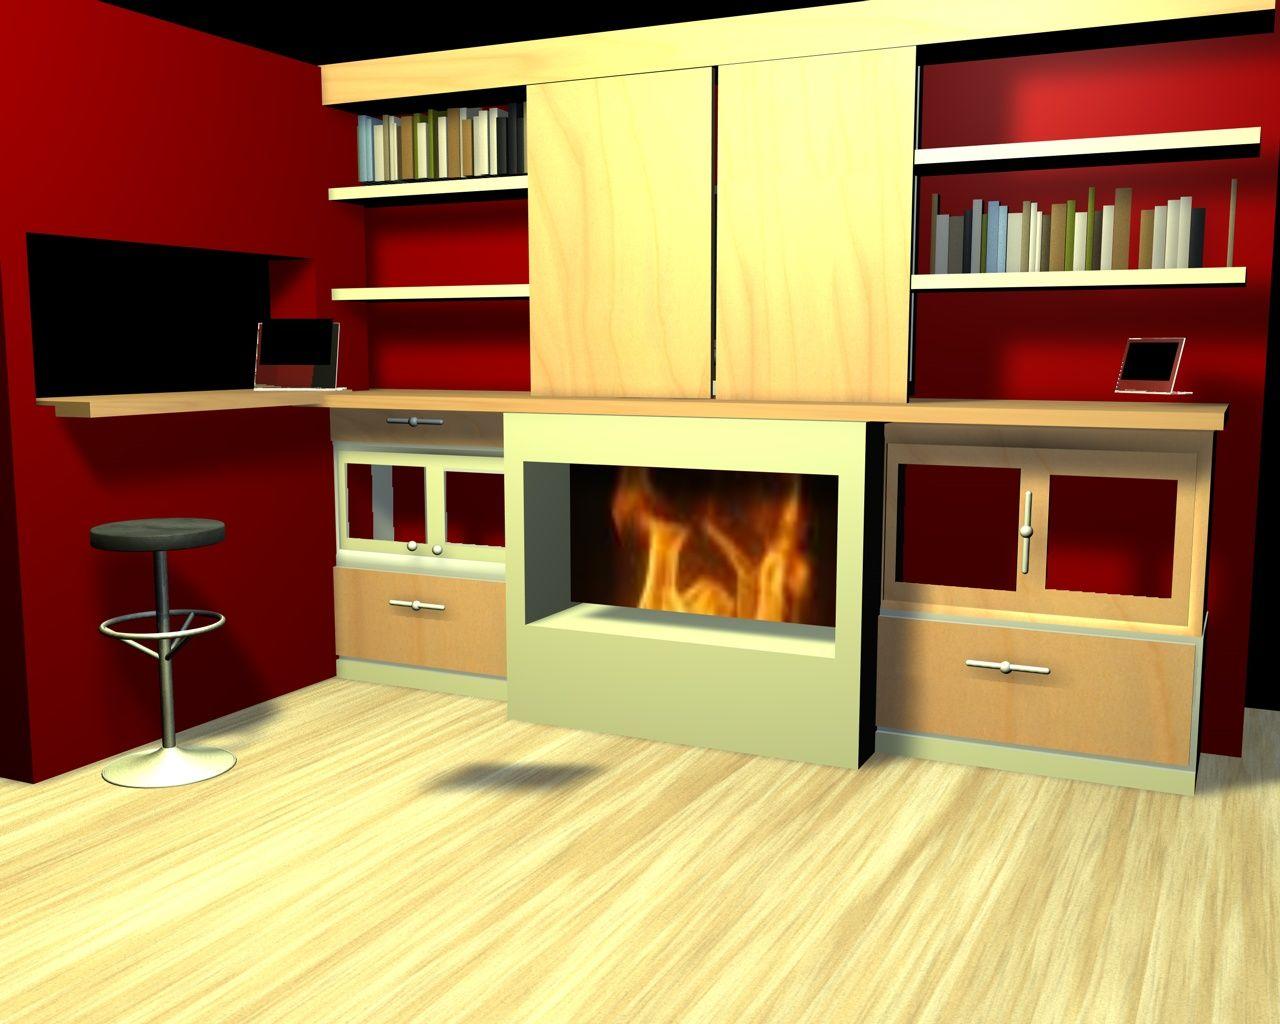 Chimenea con mueble salones con chimenea fireplaces - El mueble chimeneas ...